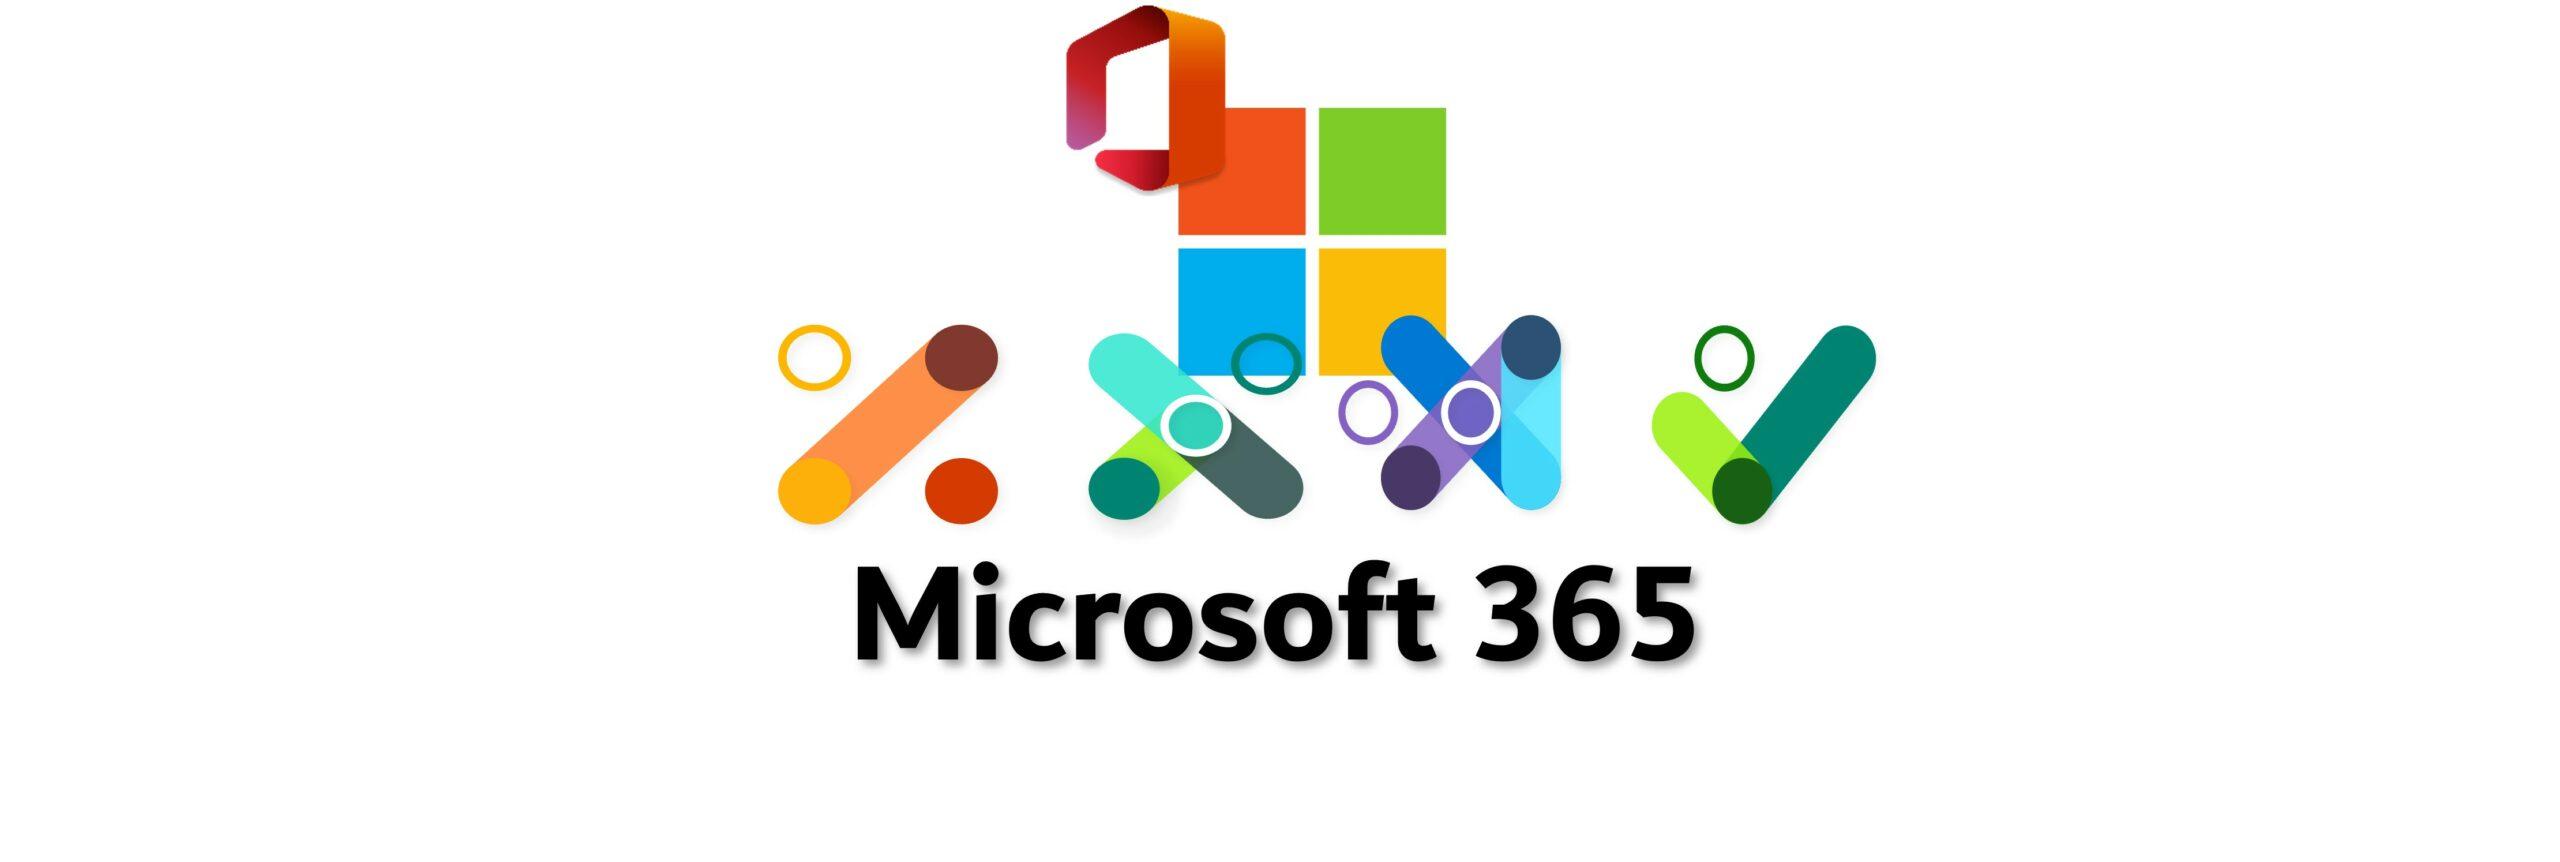 Microsoft 365 Logos